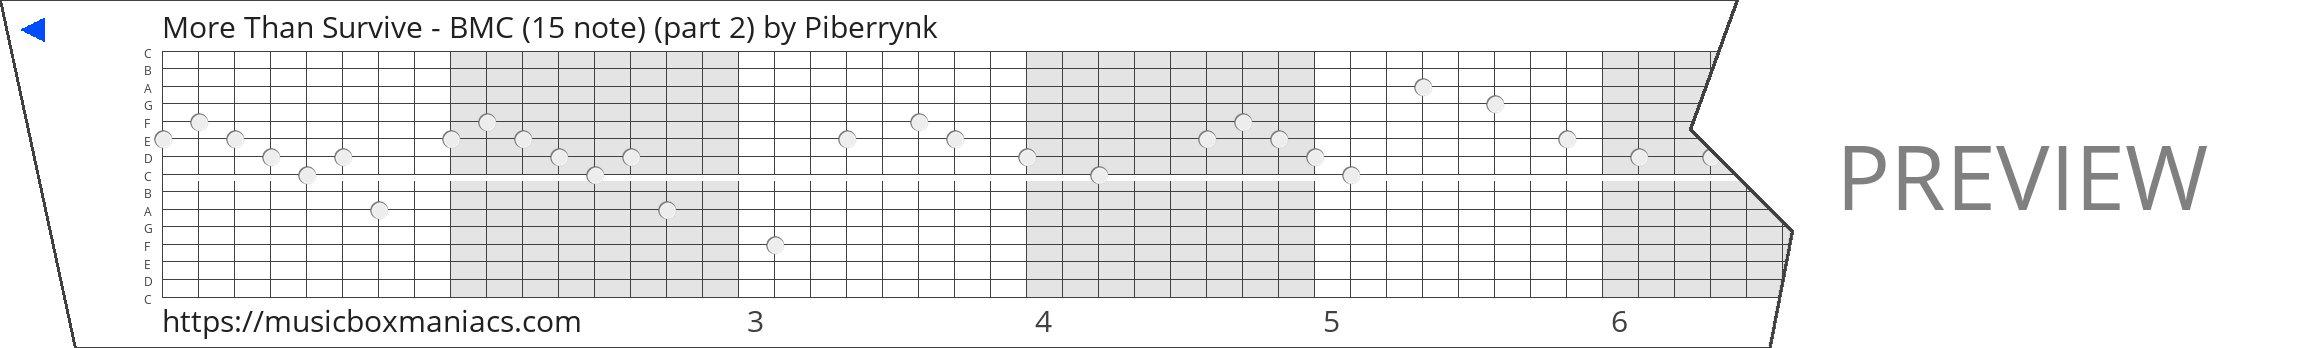 More Than Survive - BMC (15 note) (part 2) 15 note music box paper strip